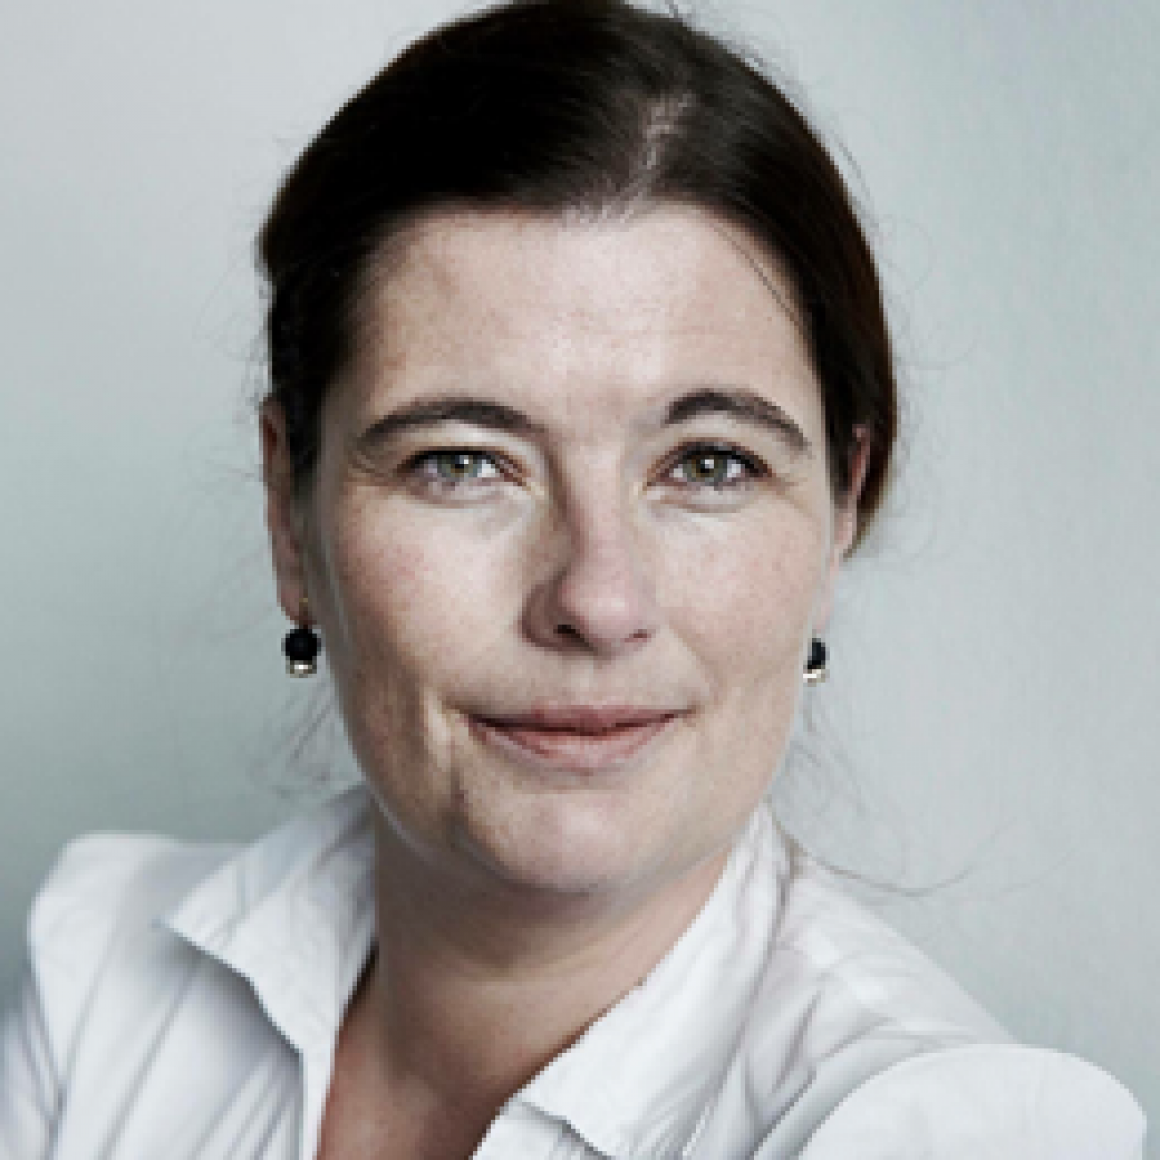 Jatc Greece Partner6 Sascha Maria Lowenstein